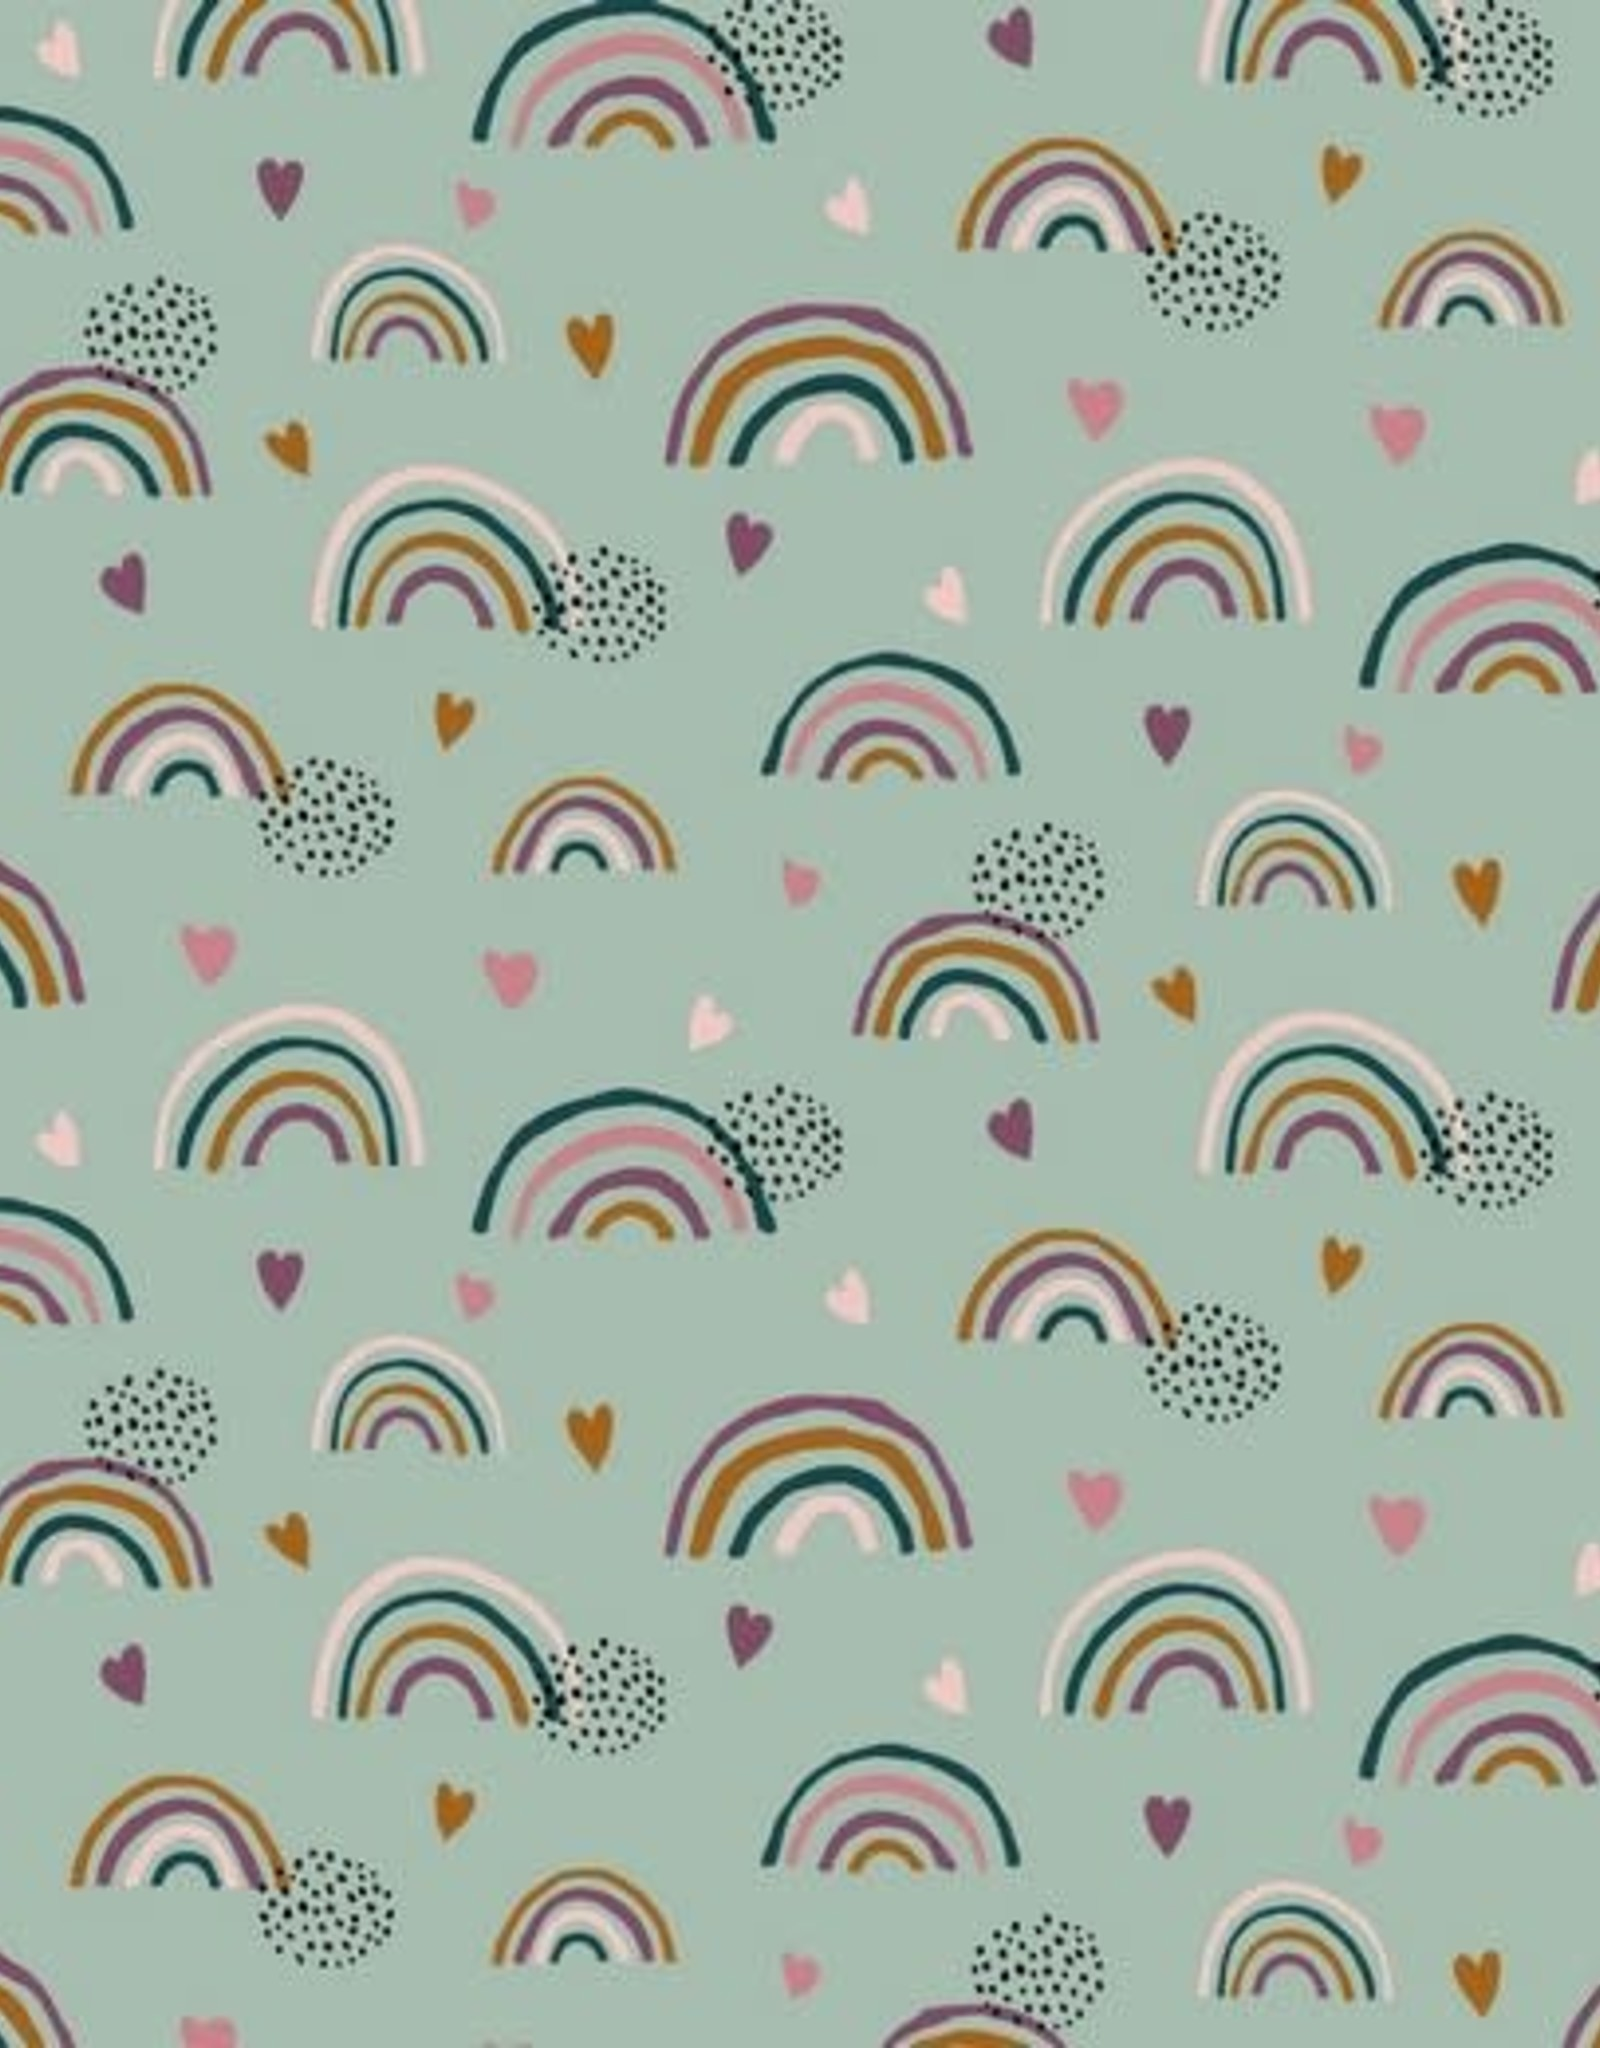 Poppy *Tricot katoen GOTS rainbow munt